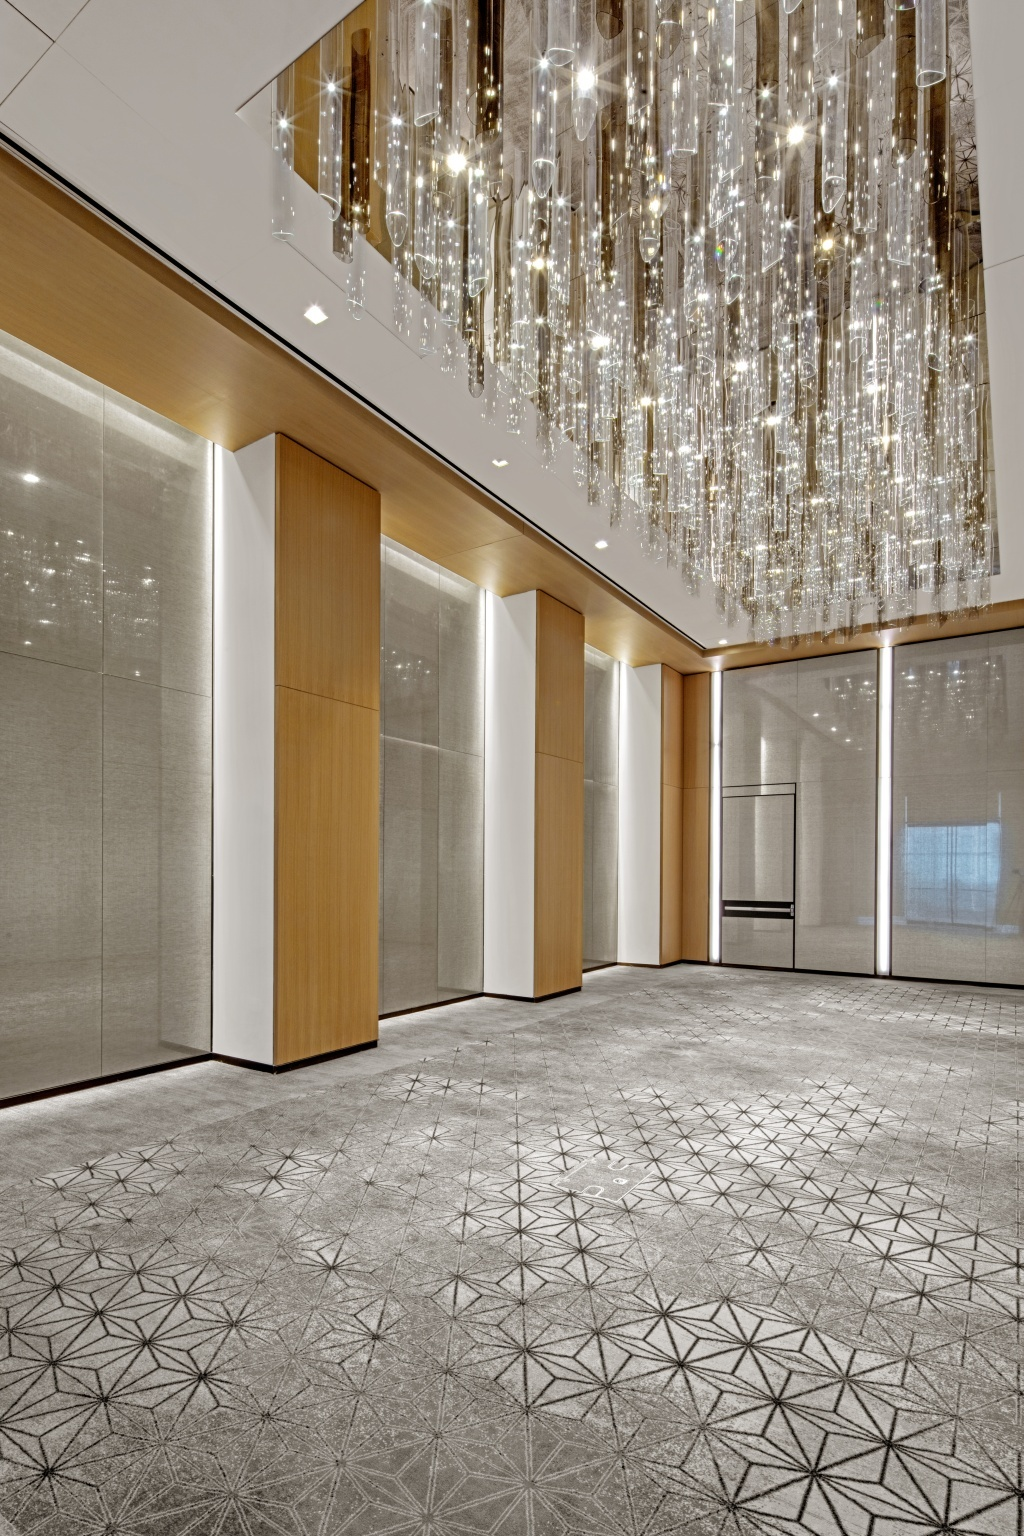 Preciosa Lighting - Conrad hotel Washington 4